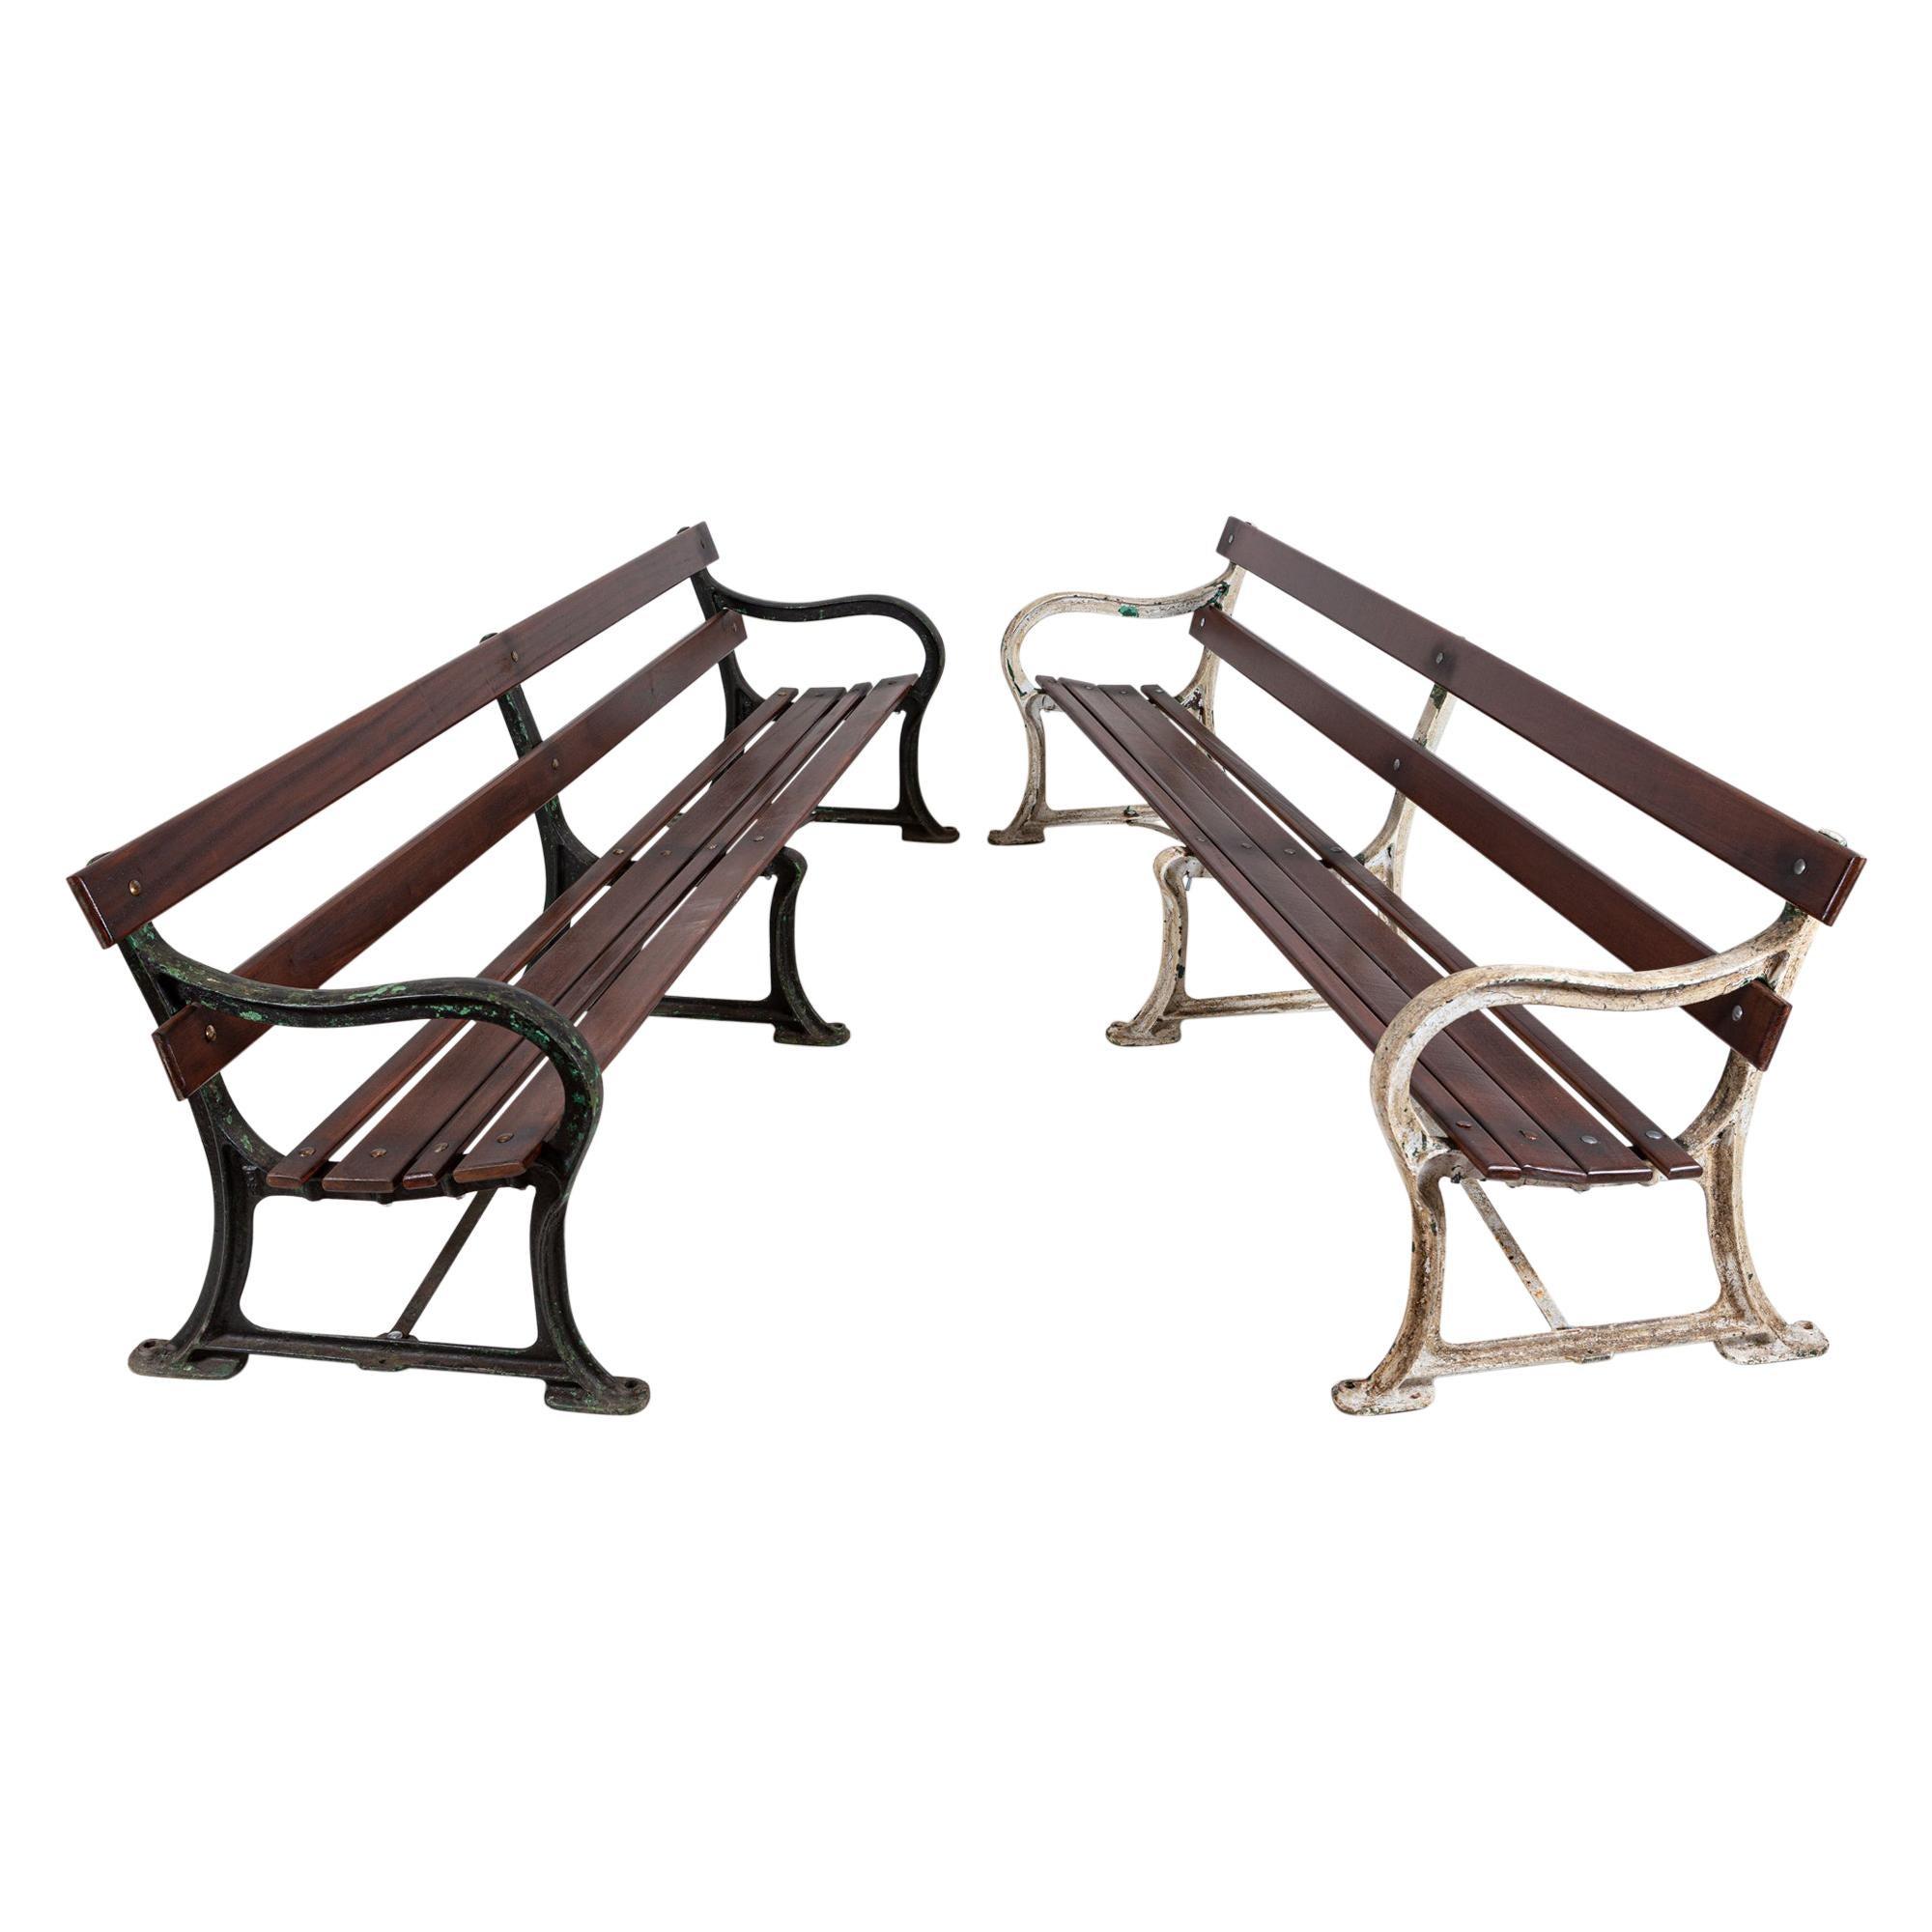 Pair 19thC English Cast Iron Benches